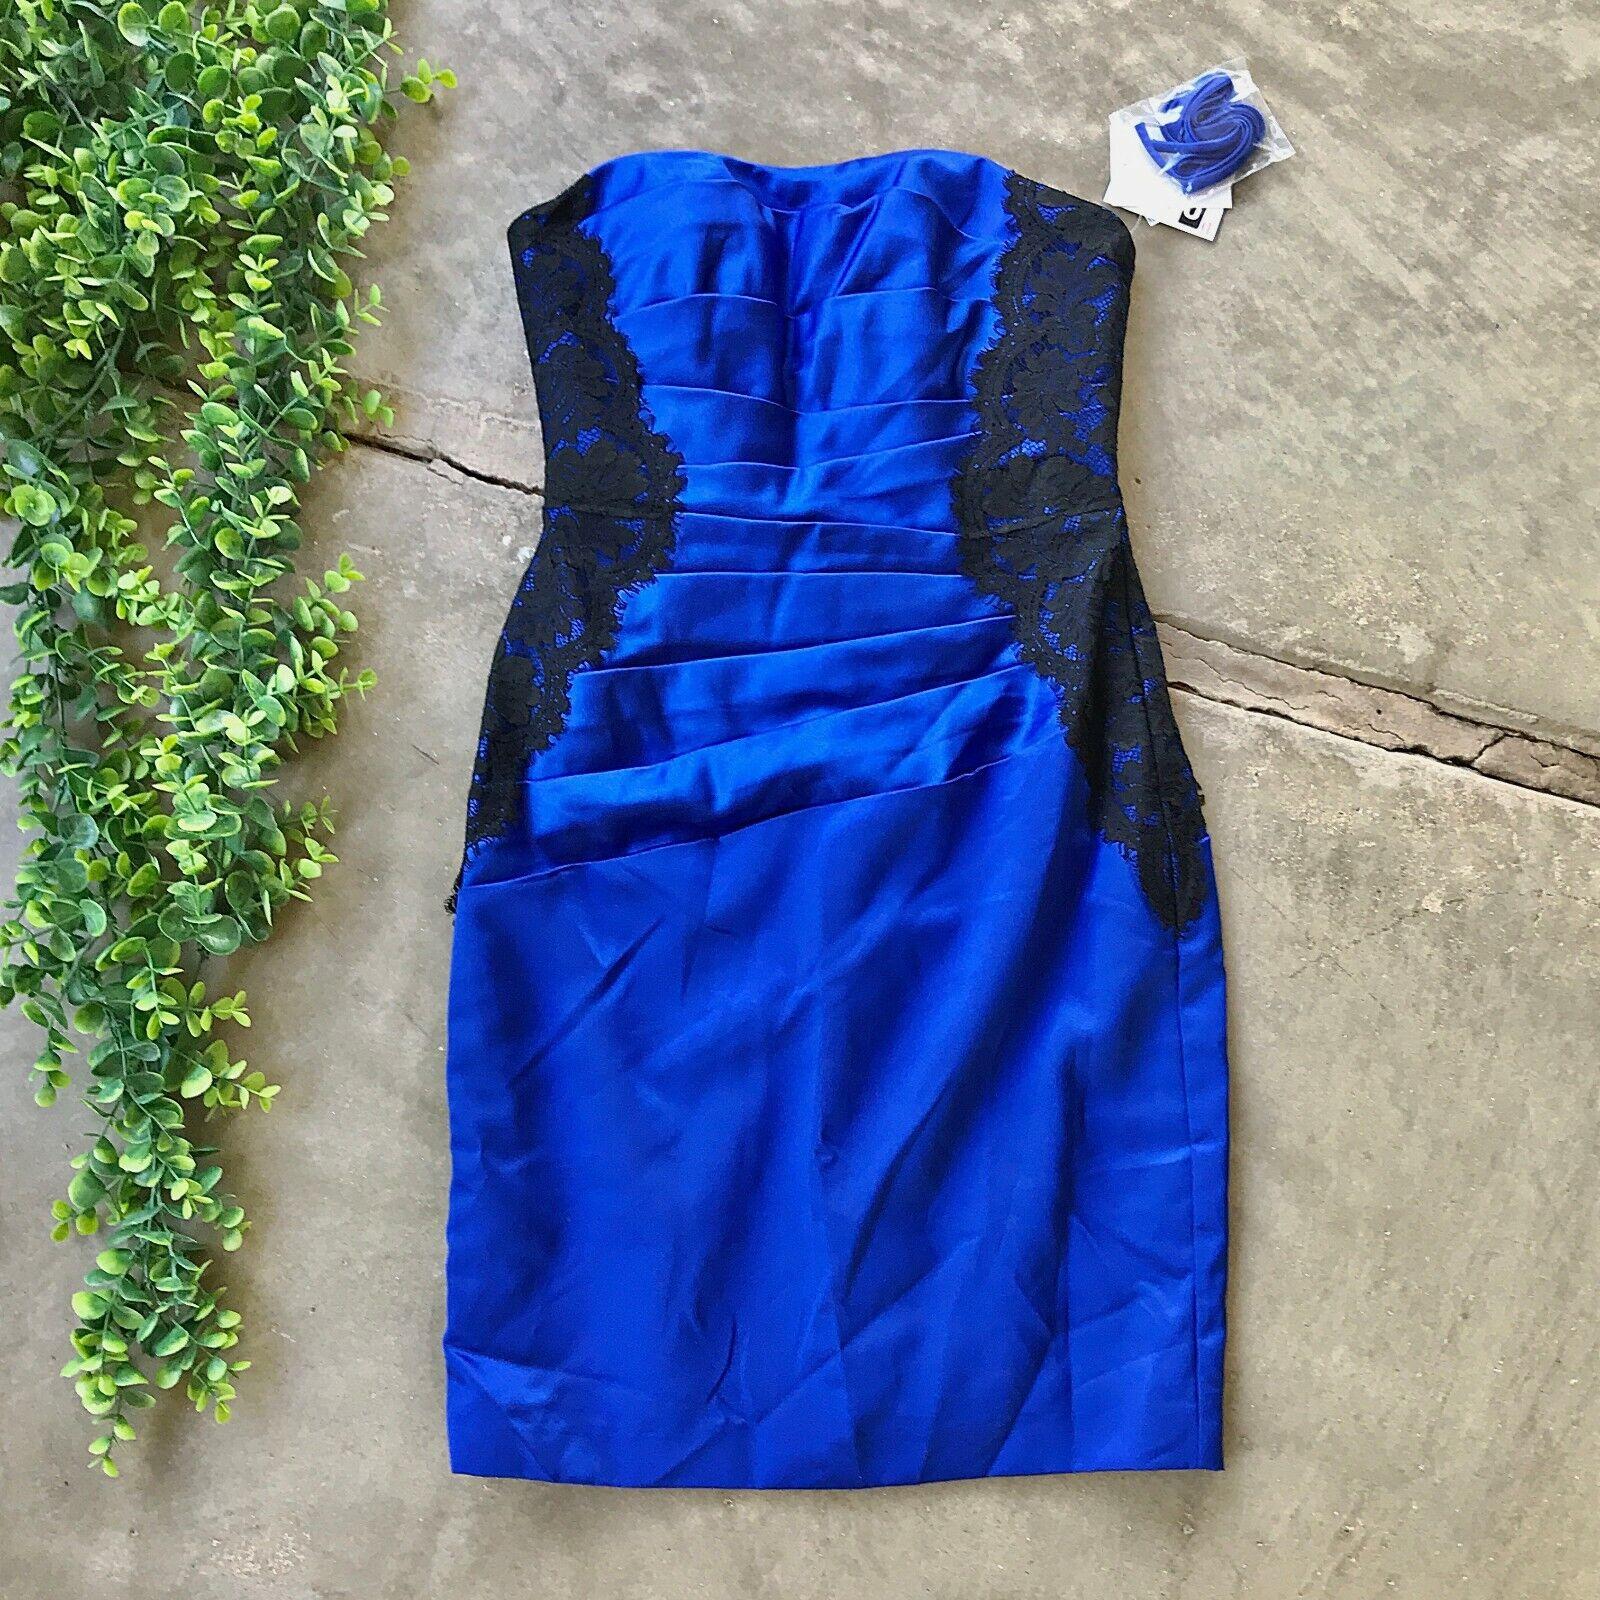 New Davids Bridal Strapless Dress • Blue Black Lace Pleated • Size 2